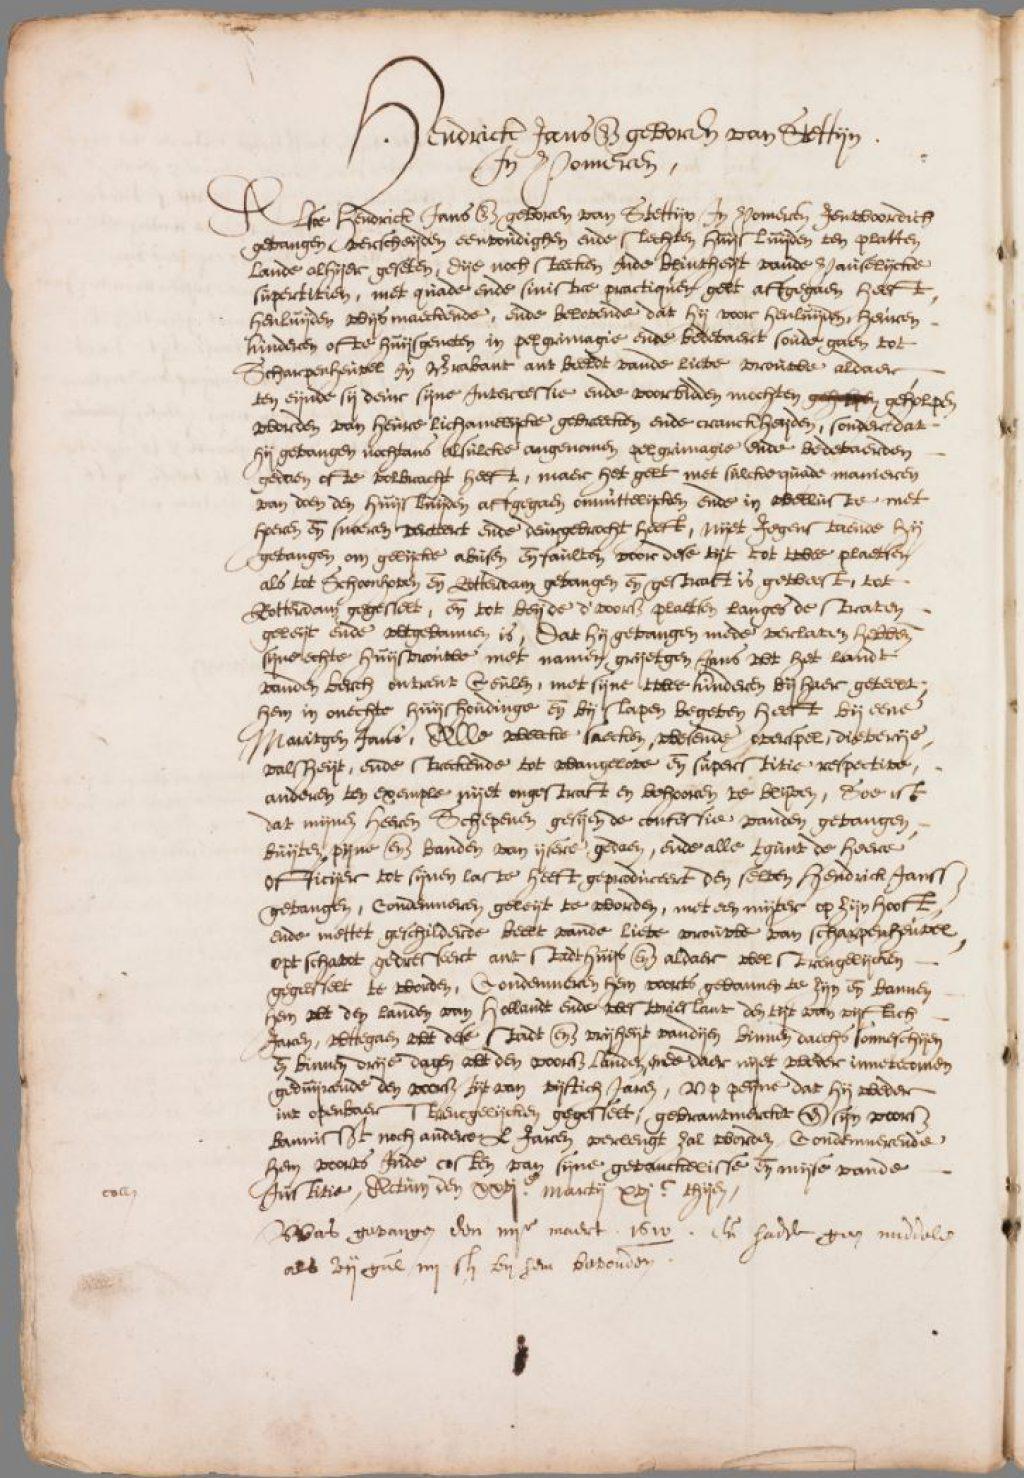 Vonnis van Hendrick Jansz, 26 maart 1610. (Archief 1, inv.nr 2384, folio 214v)